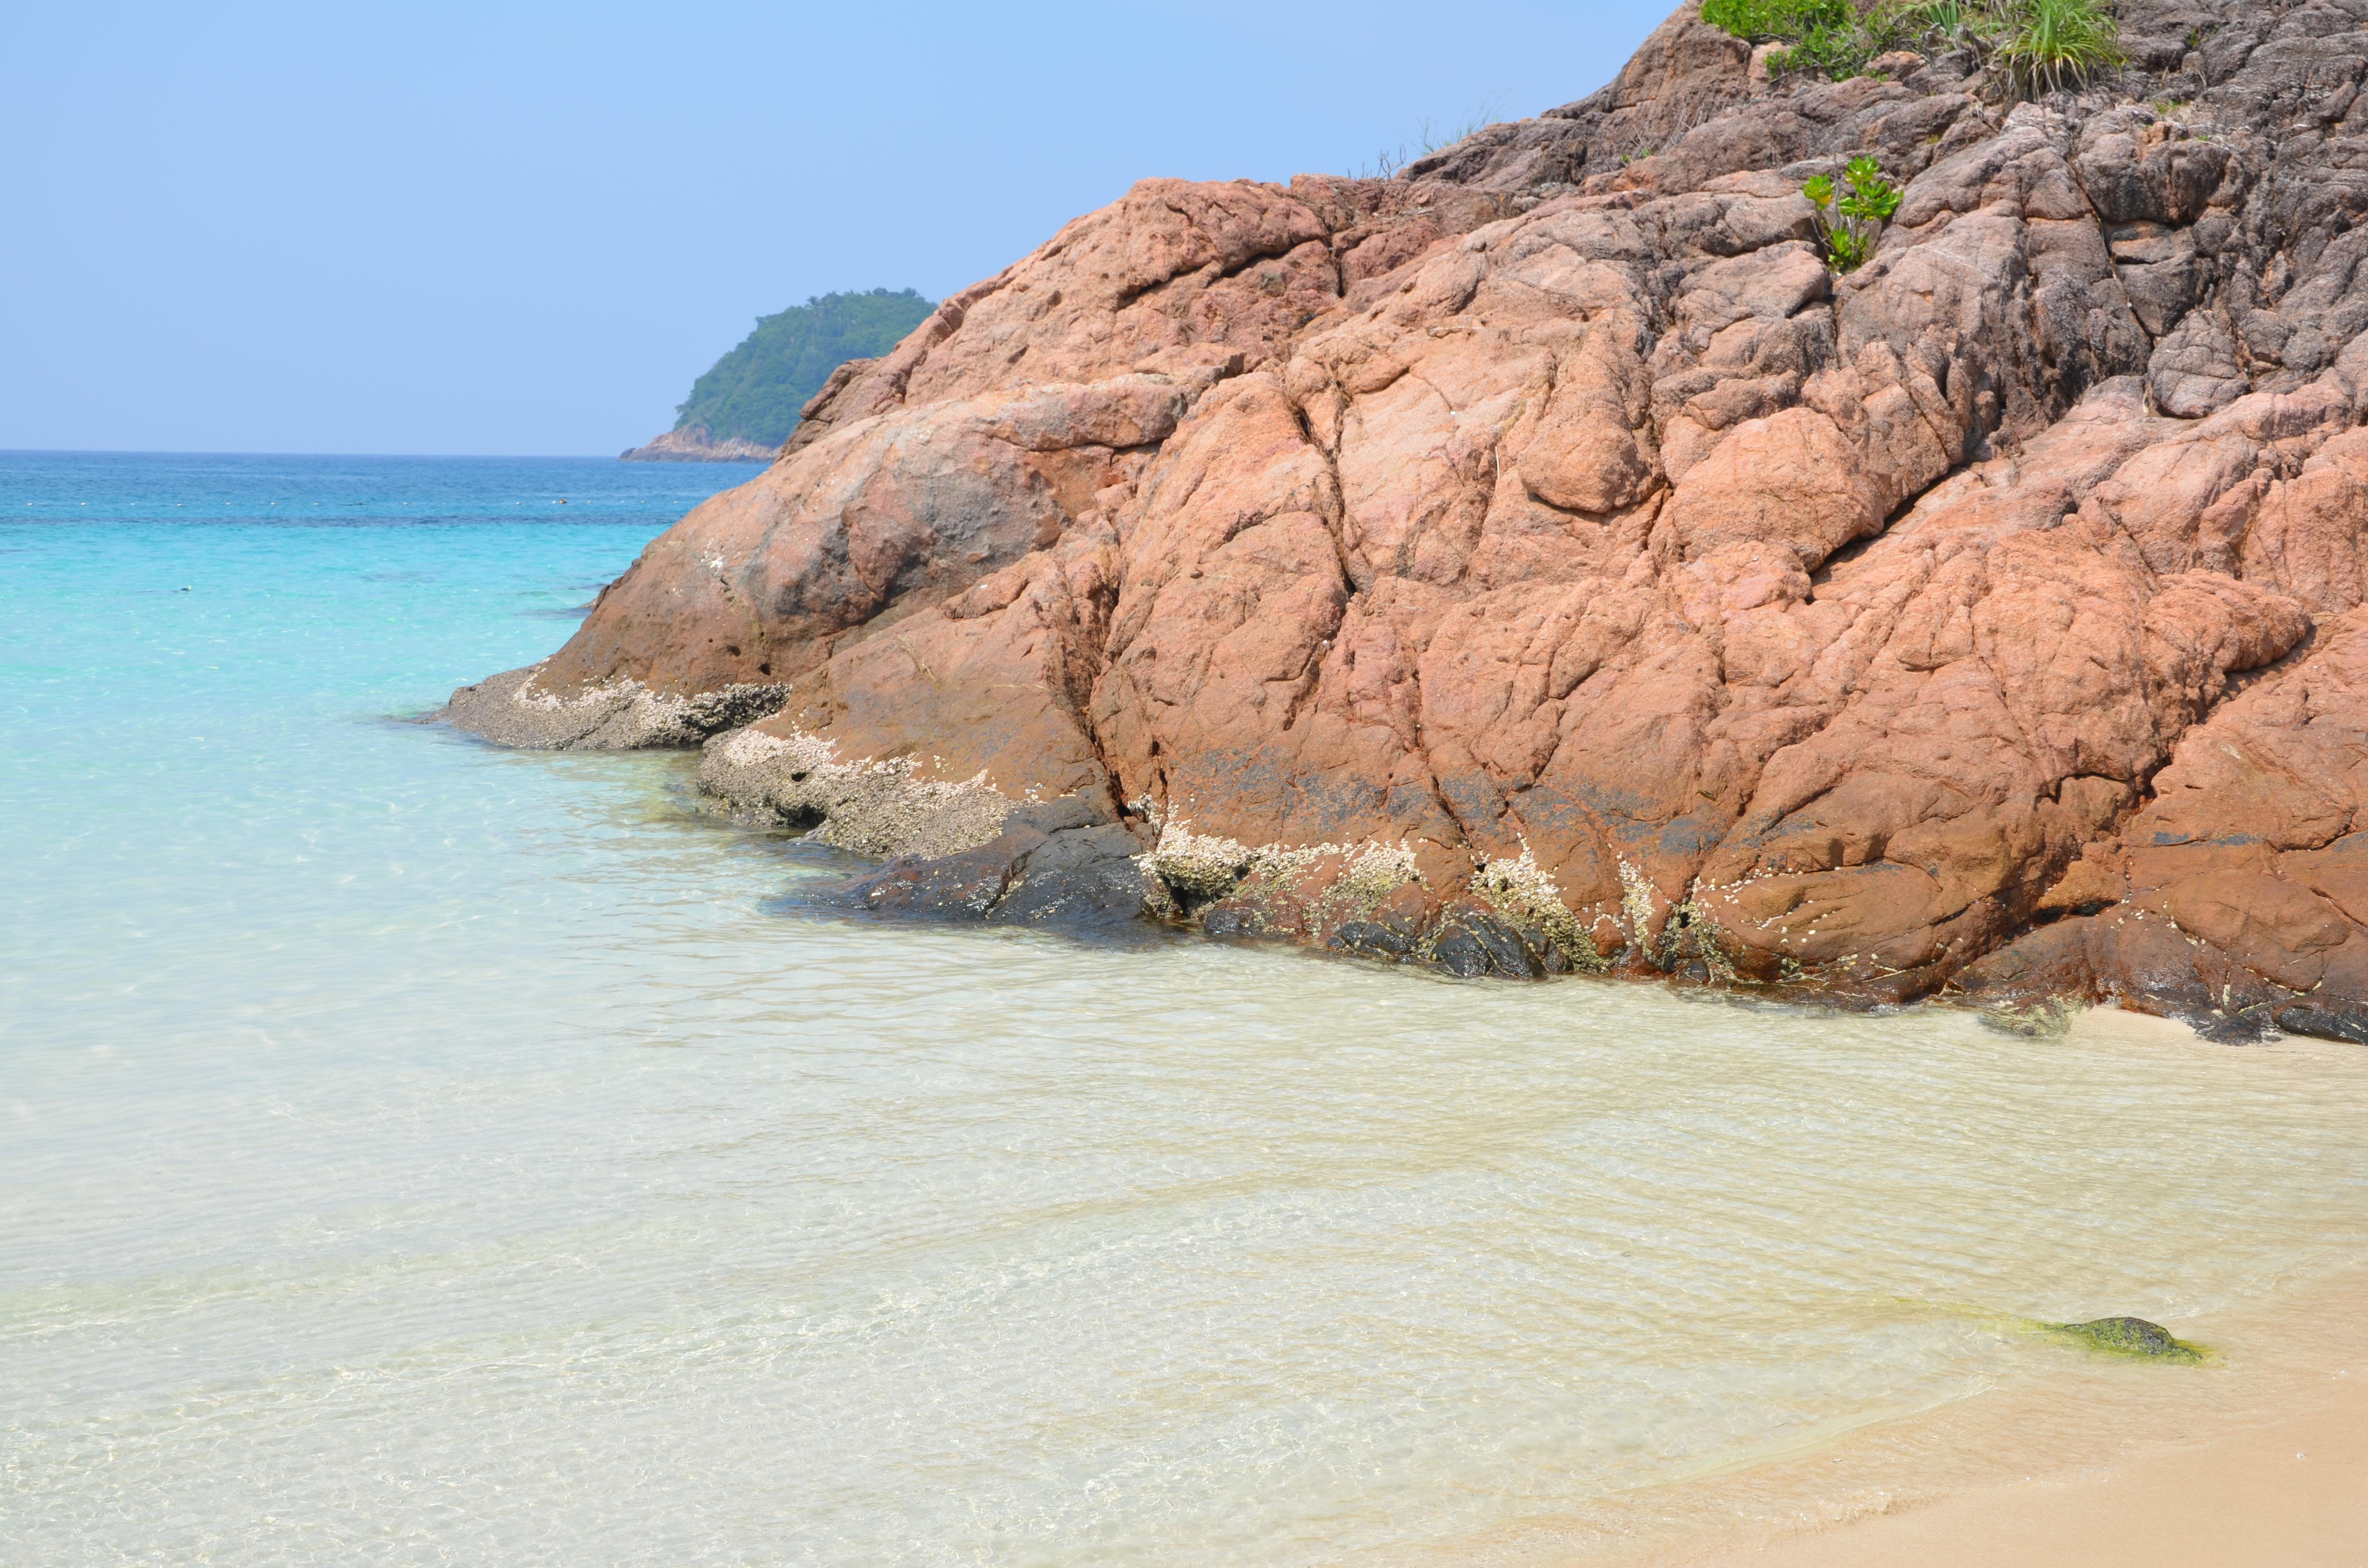 Wunderschöne Insel Redang in Malaysien